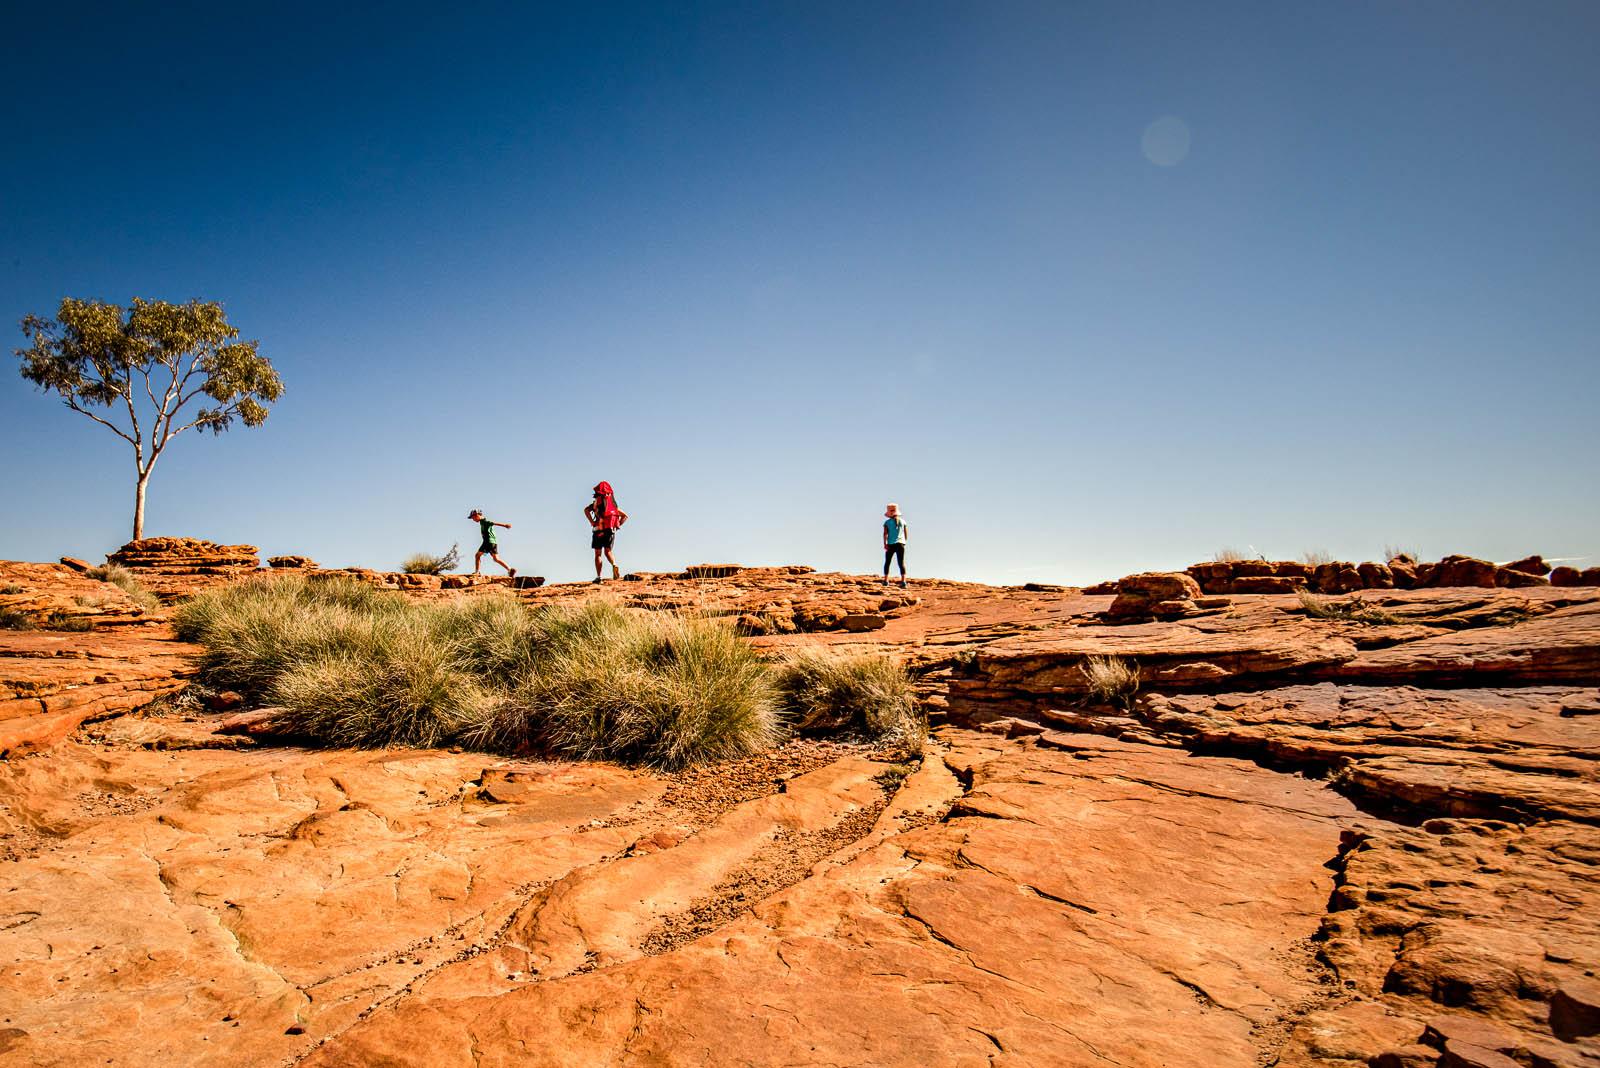 Rim Walk at Kings Canyon in the Australian Outback by Elle Walker